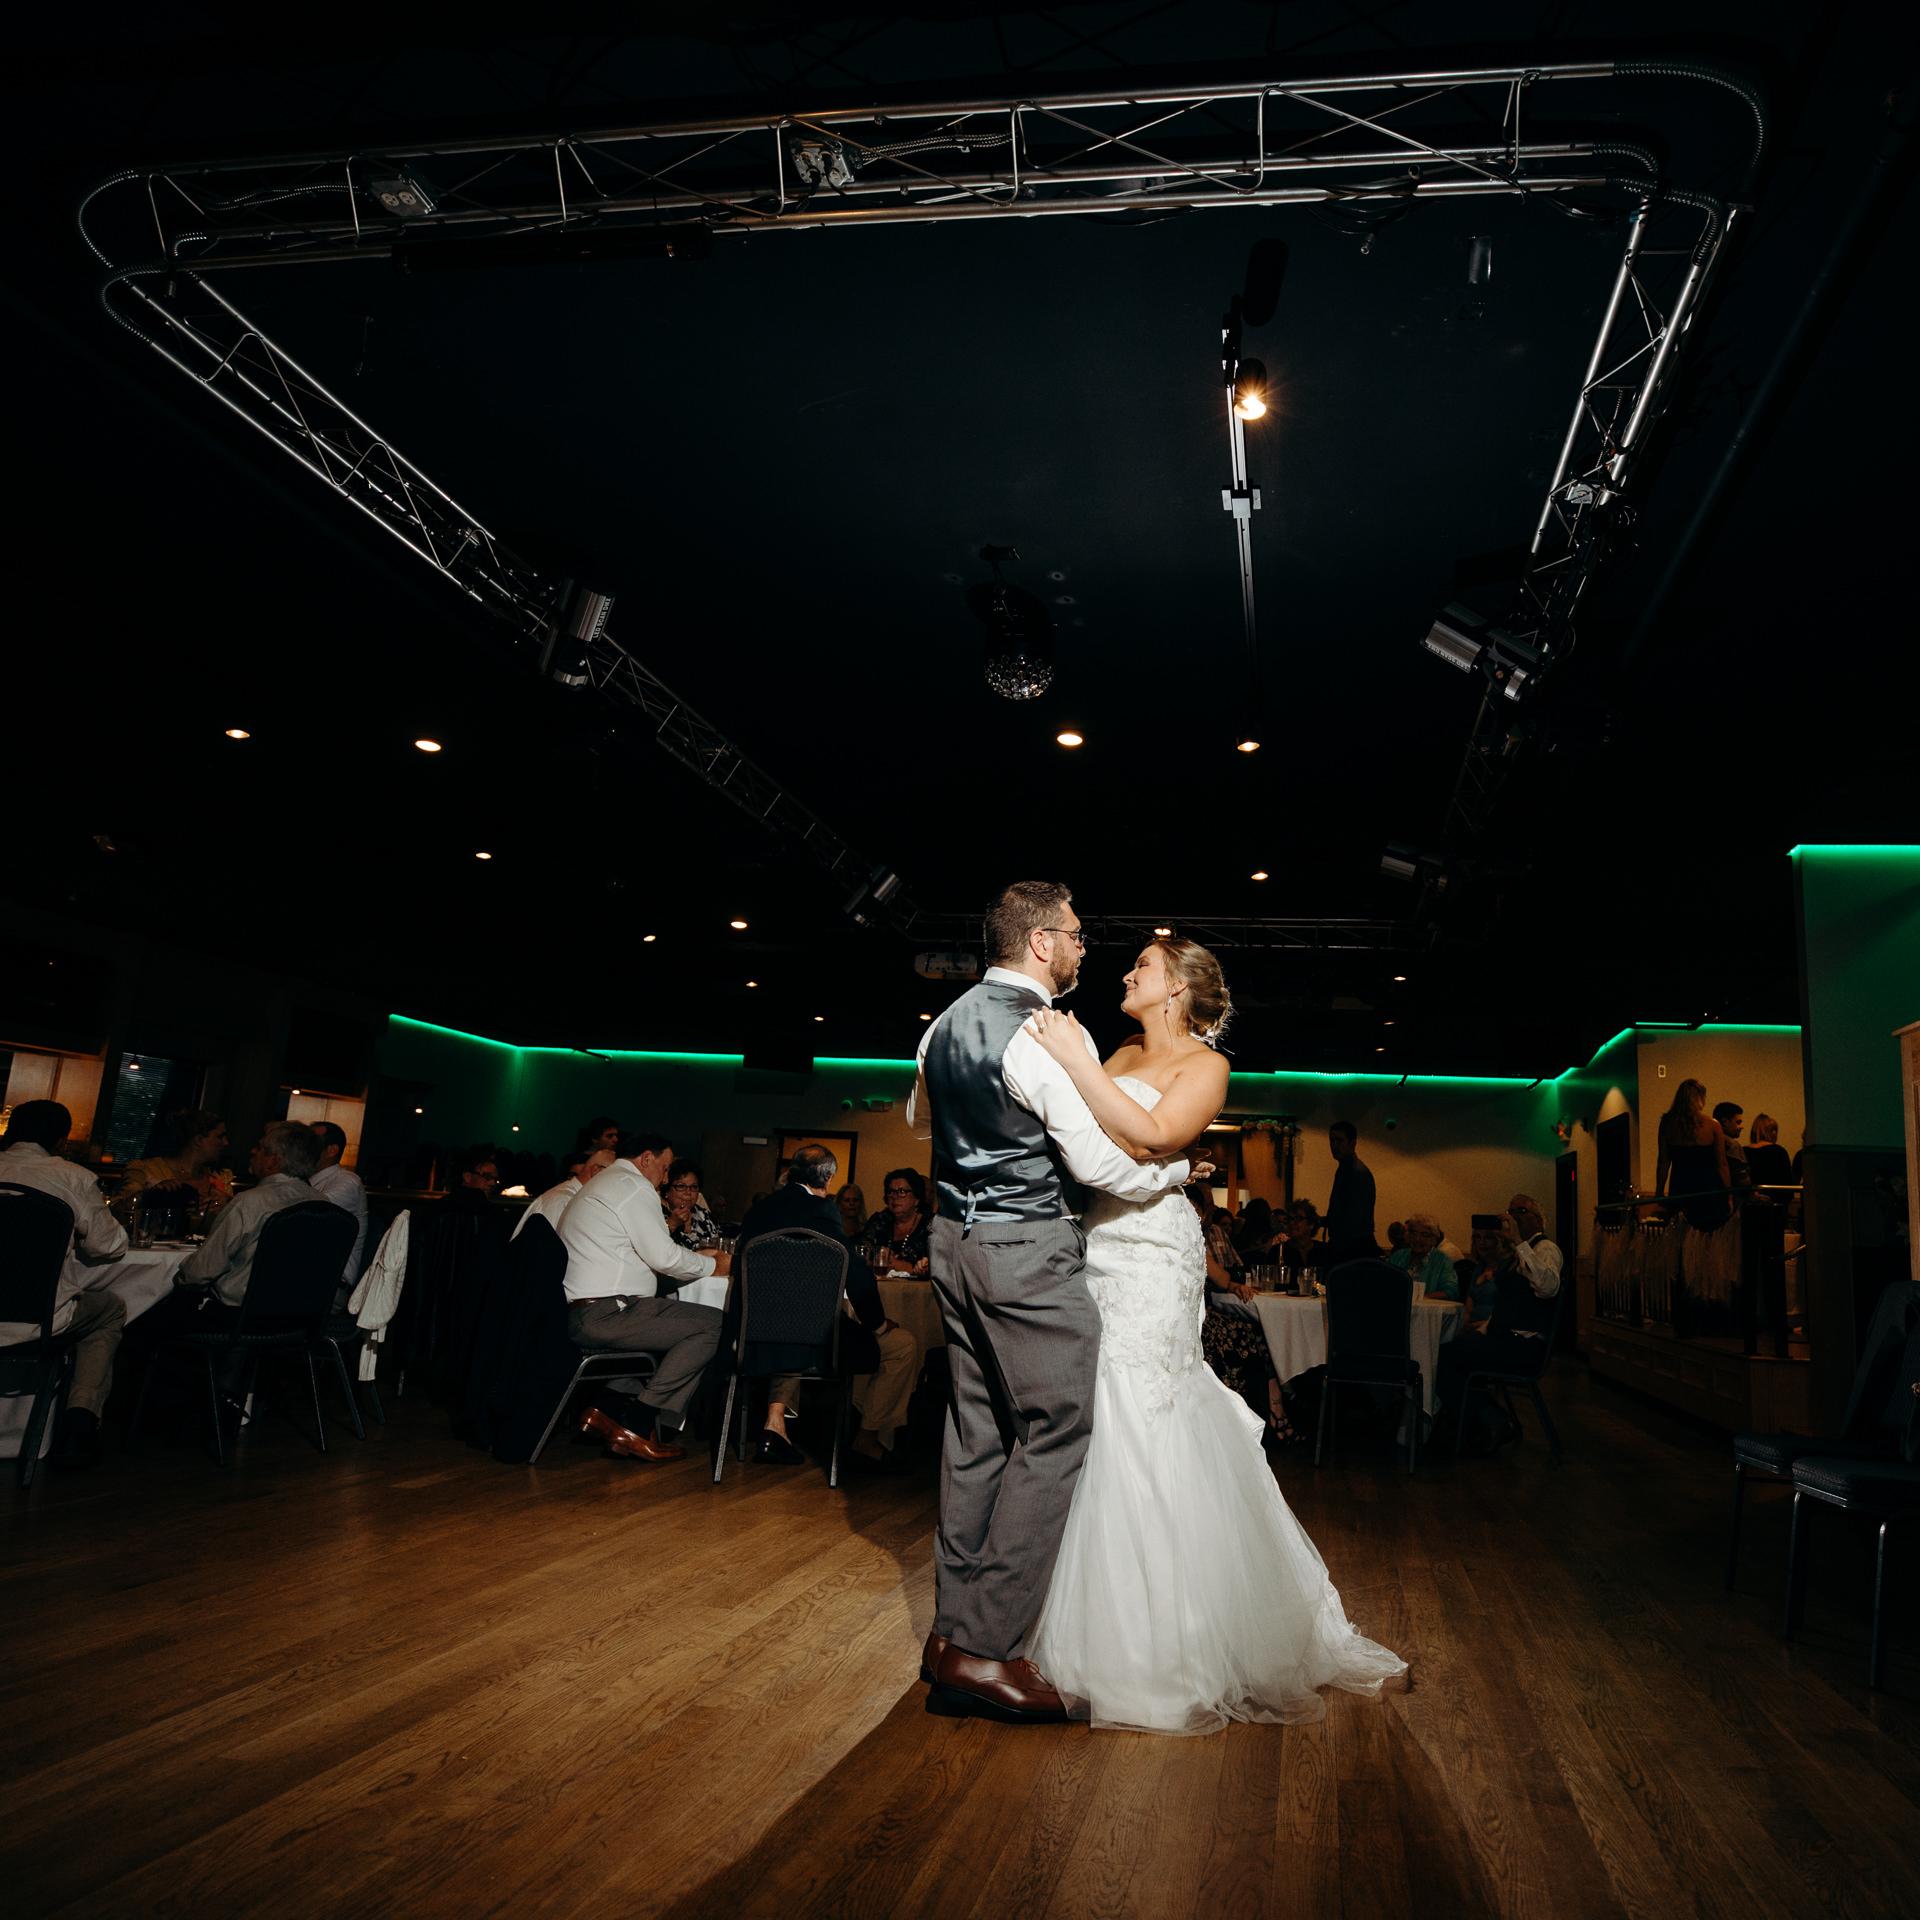 Grant Beachy Weddings photography elkhart south bend goshen warsaw-058.jpg